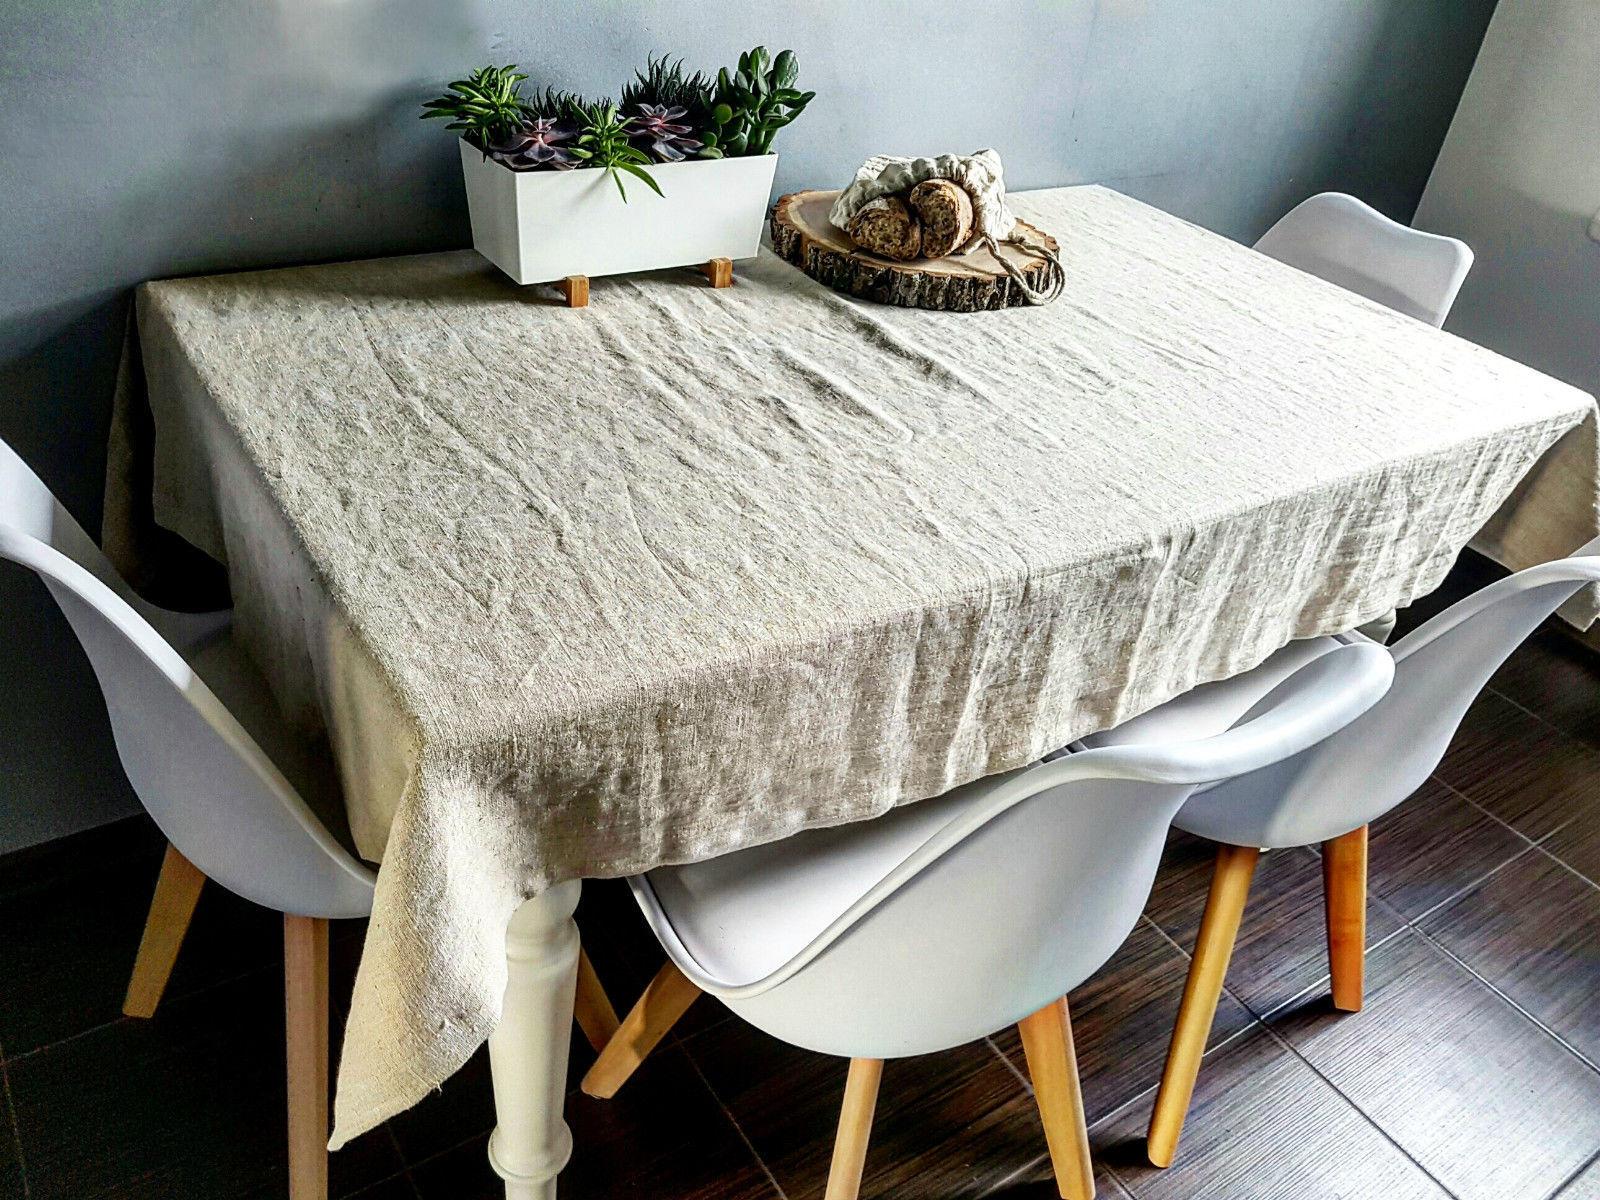 Rustic linen tablecloth, vintage linen tablecloth, stonewashed farmhouse linen